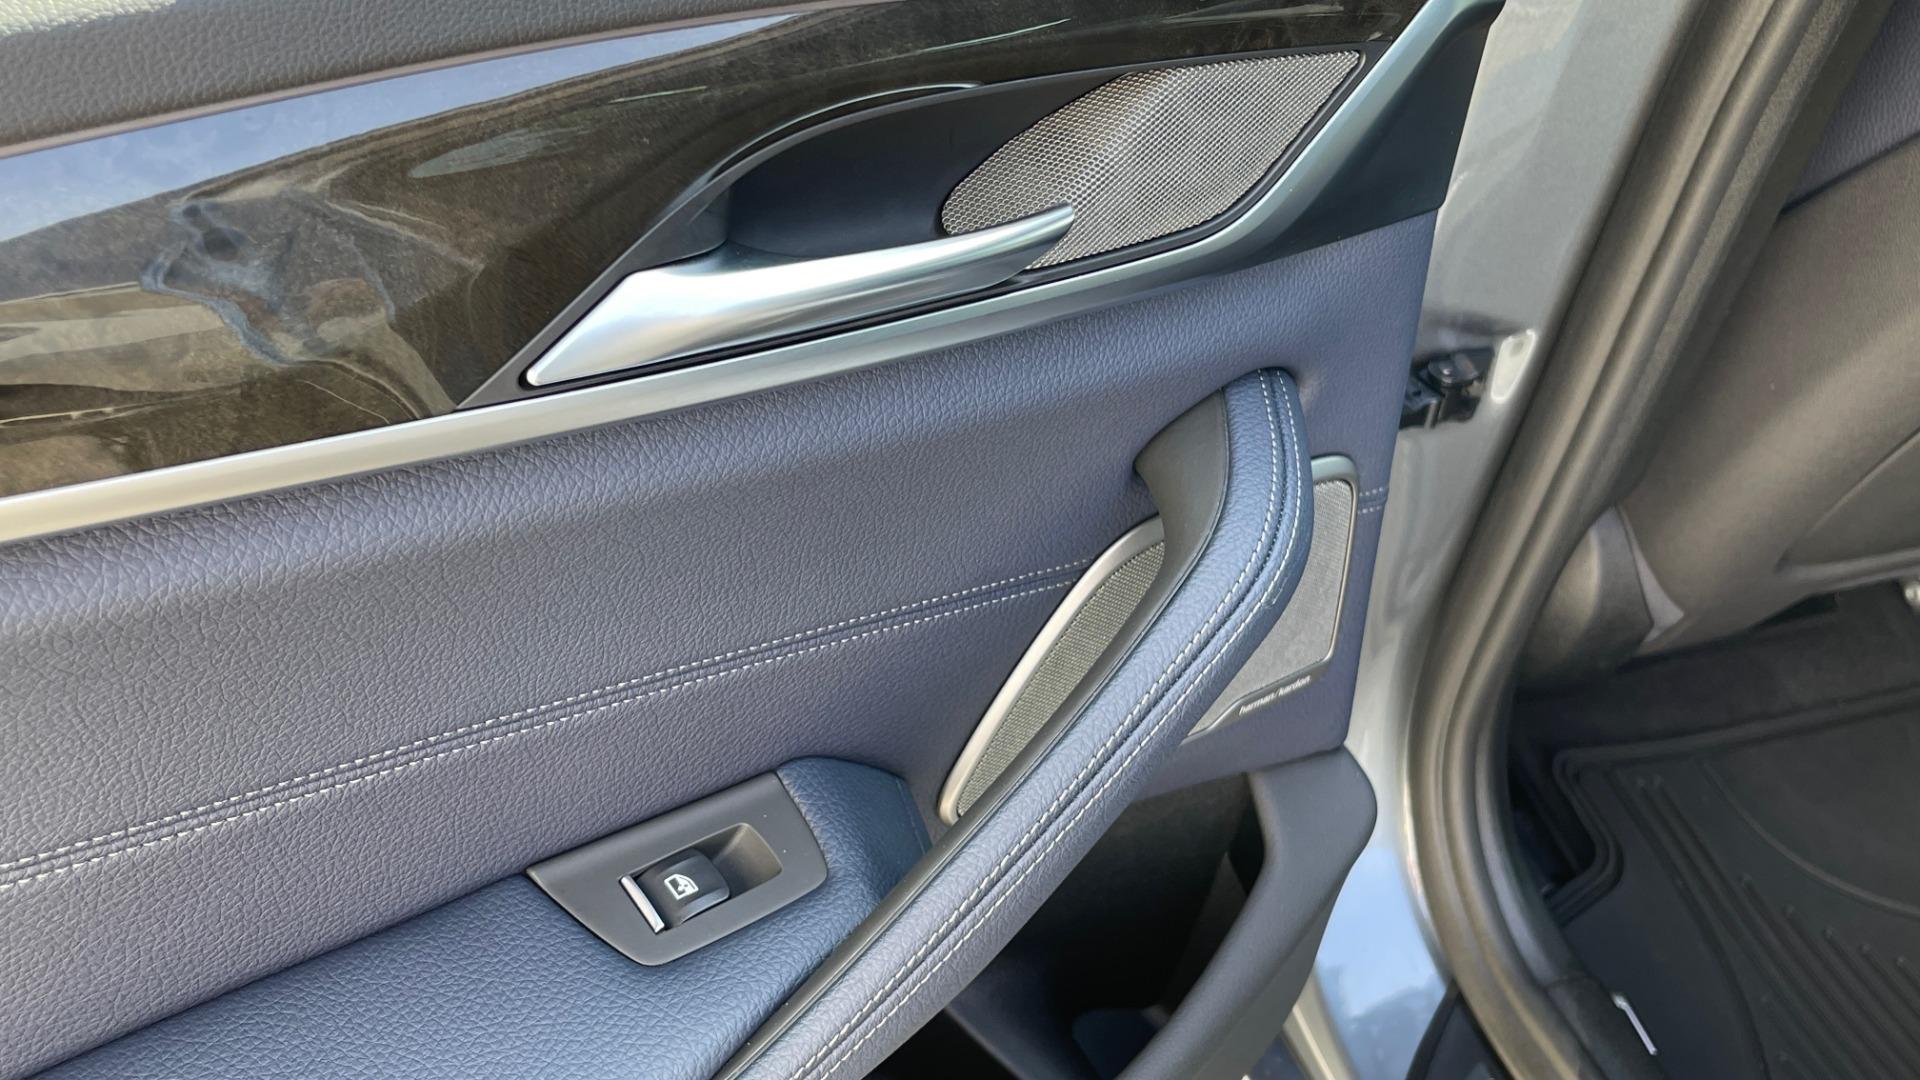 Used 2018 BMW 5 SERIES 540I XDRIVE M-SPORT / DRVR ASST / PDC / APPLE / HUD / H/K SND for sale $42,795 at Formula Imports in Charlotte NC 28227 51